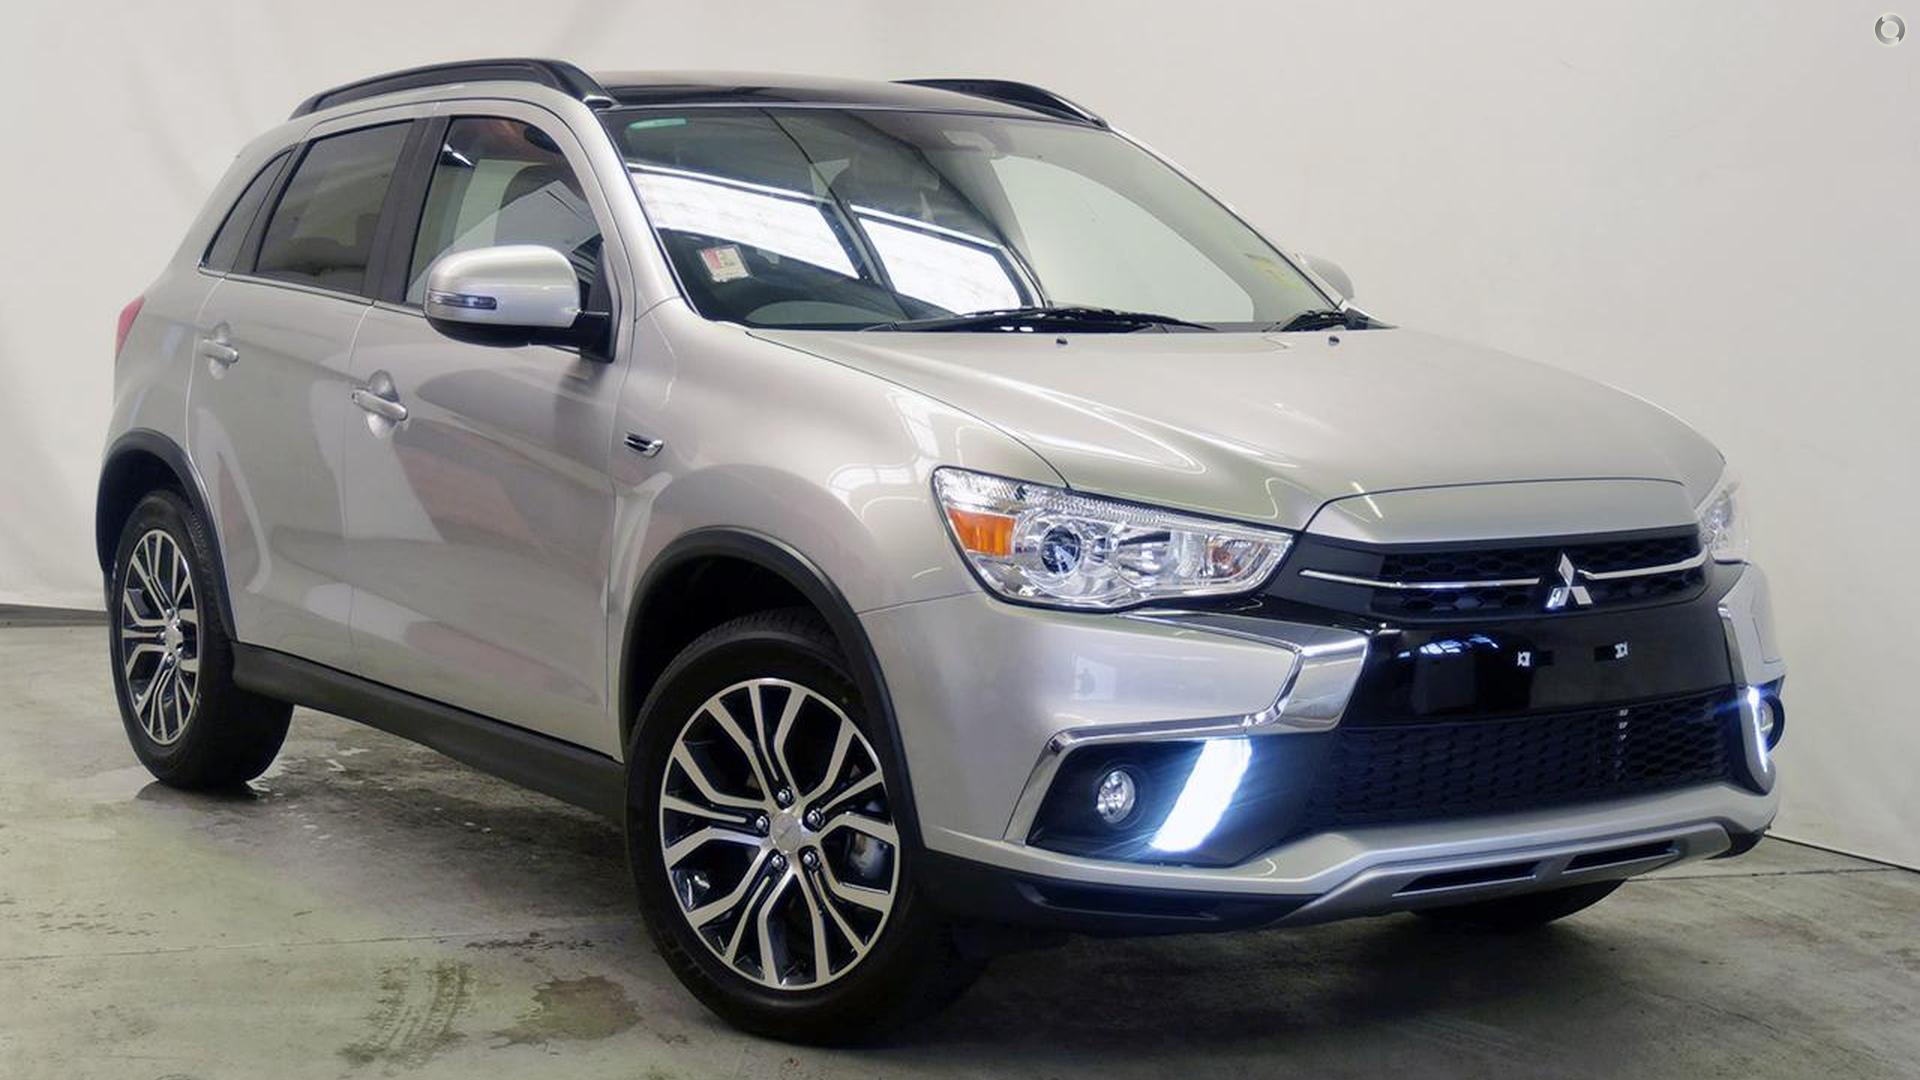 2018 Mitsubishi Asx Xls